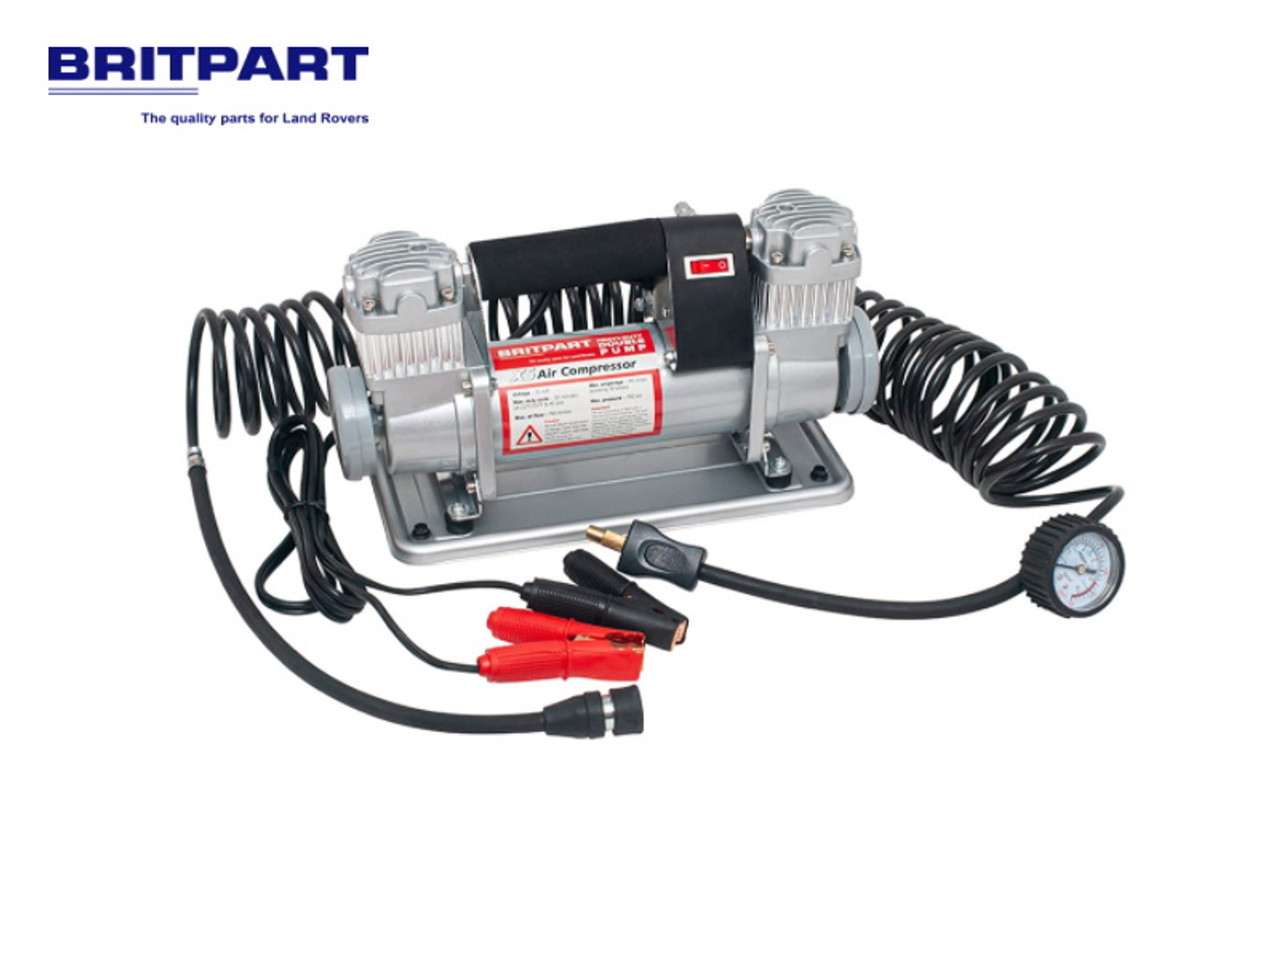 Britpart XS Portable Dual Air Compressor - DA2392XS